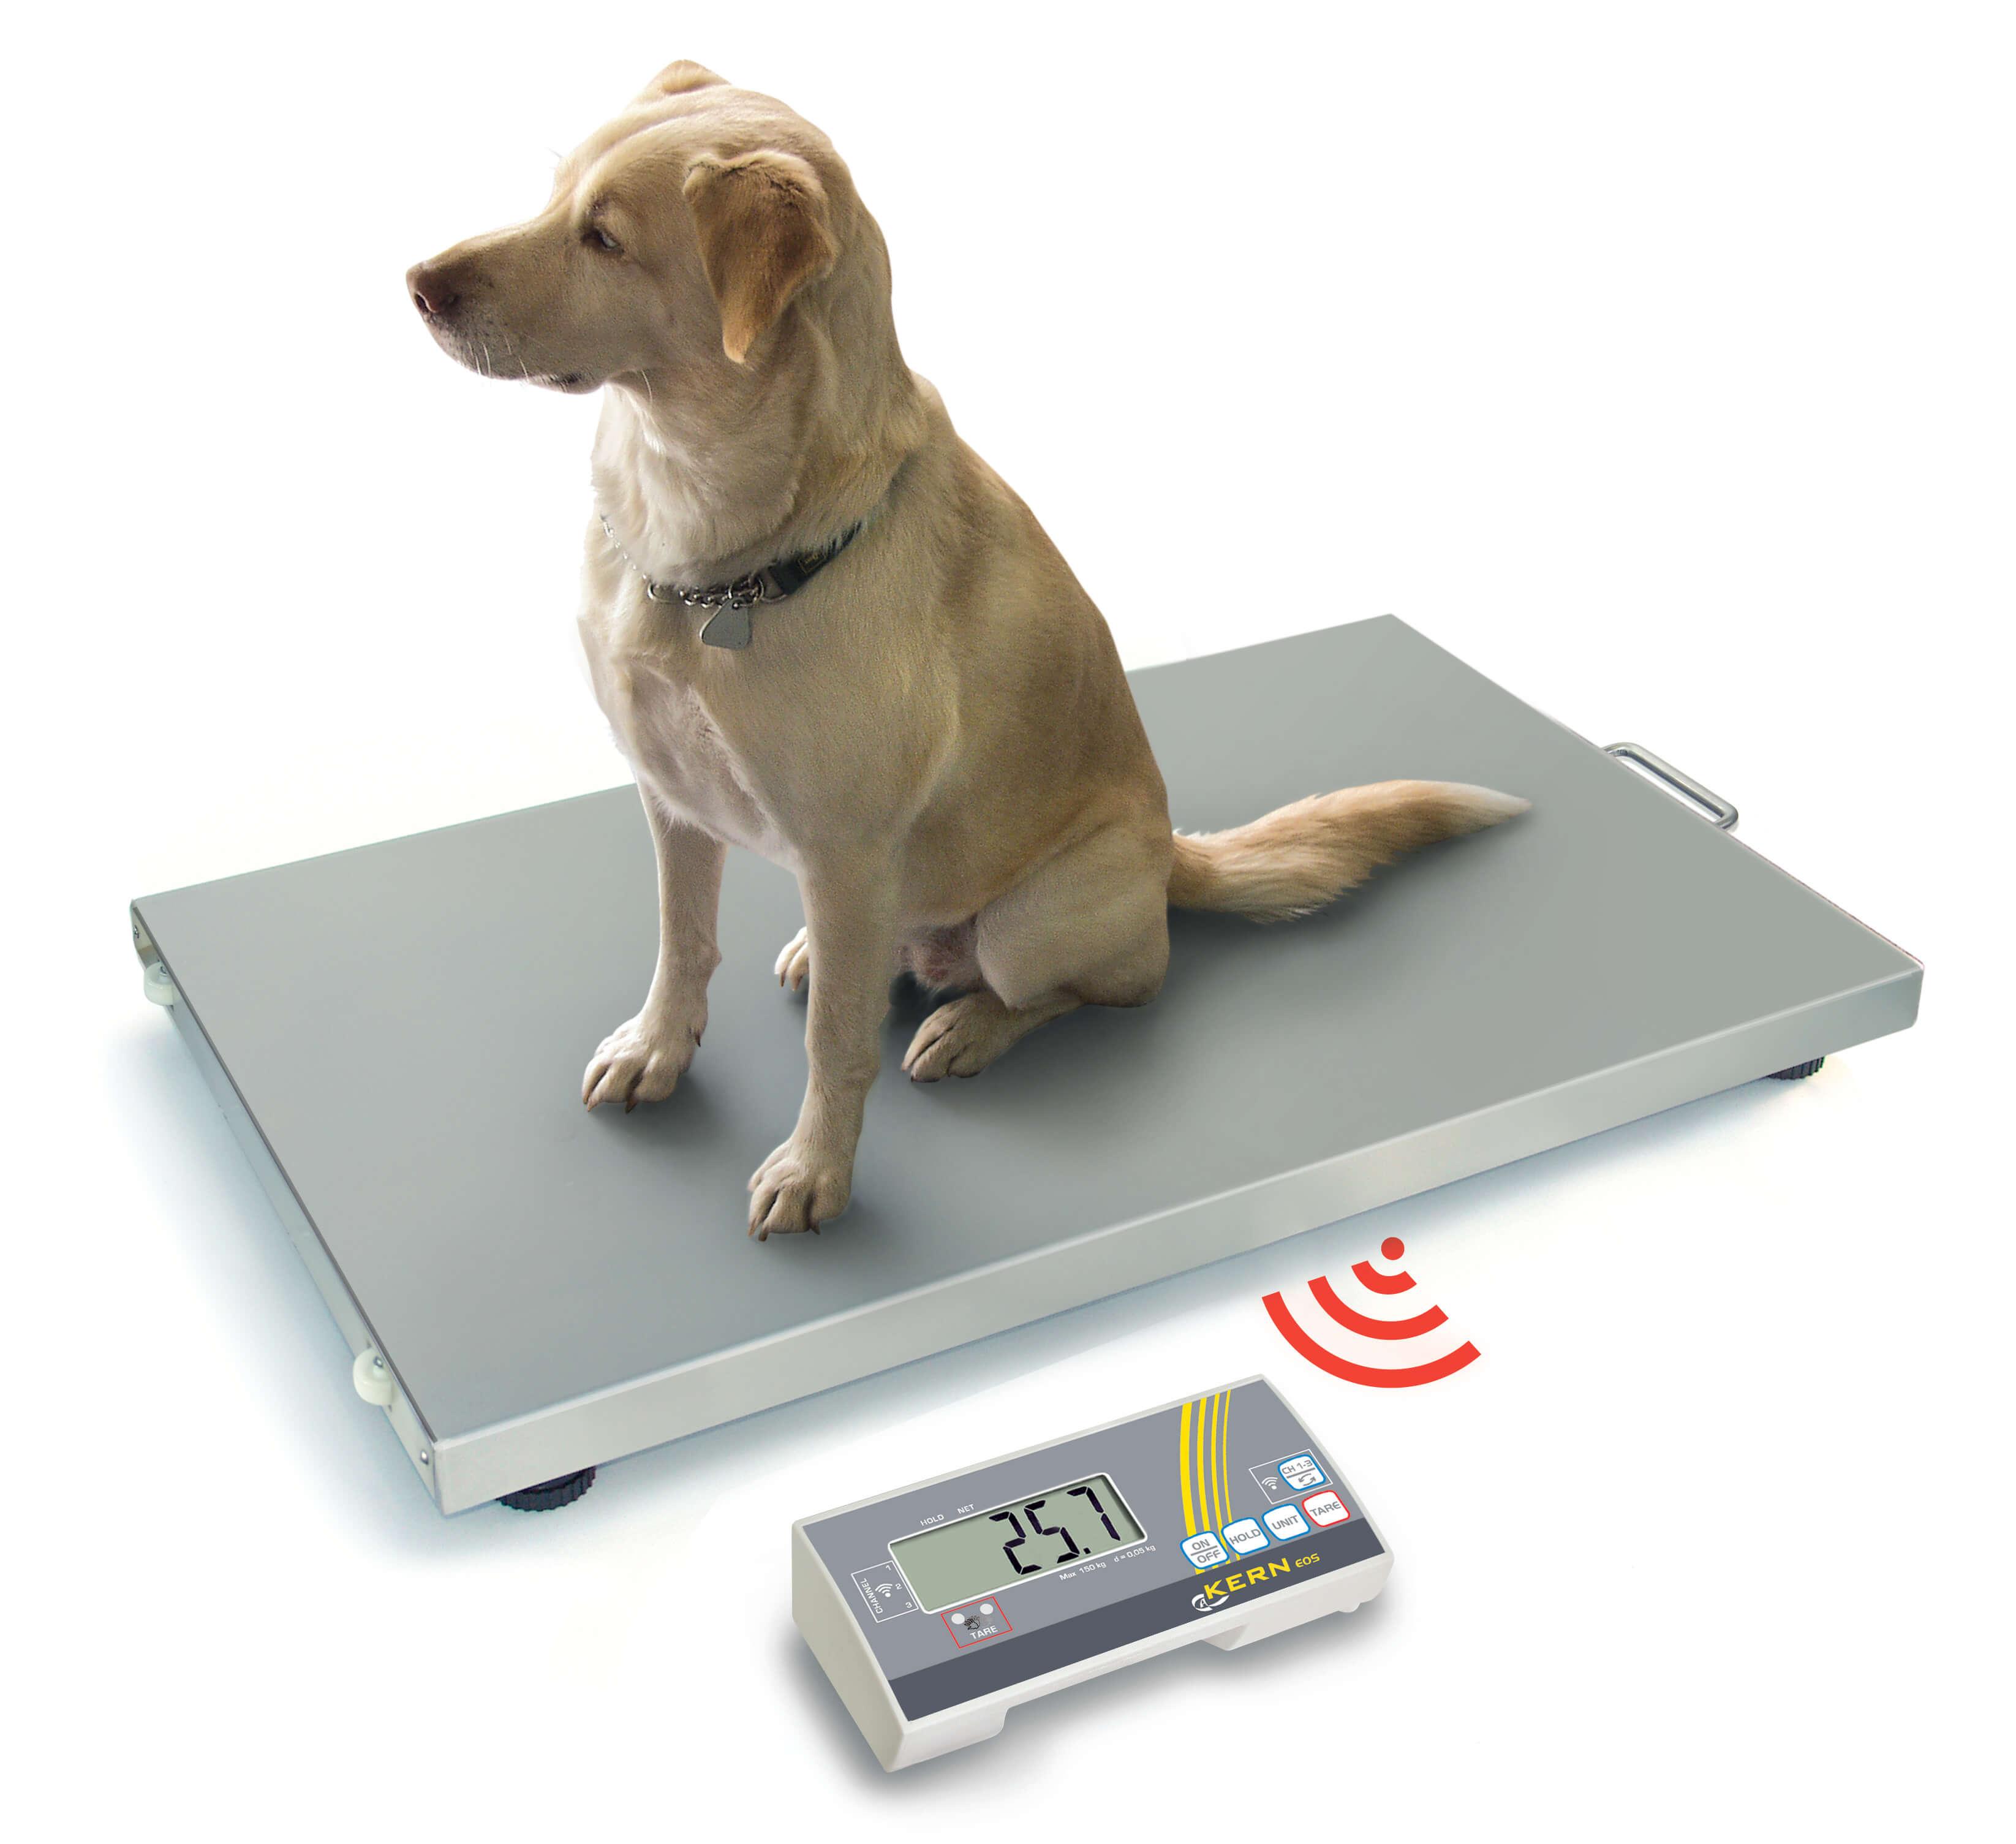 Bilancia per cani senza fili